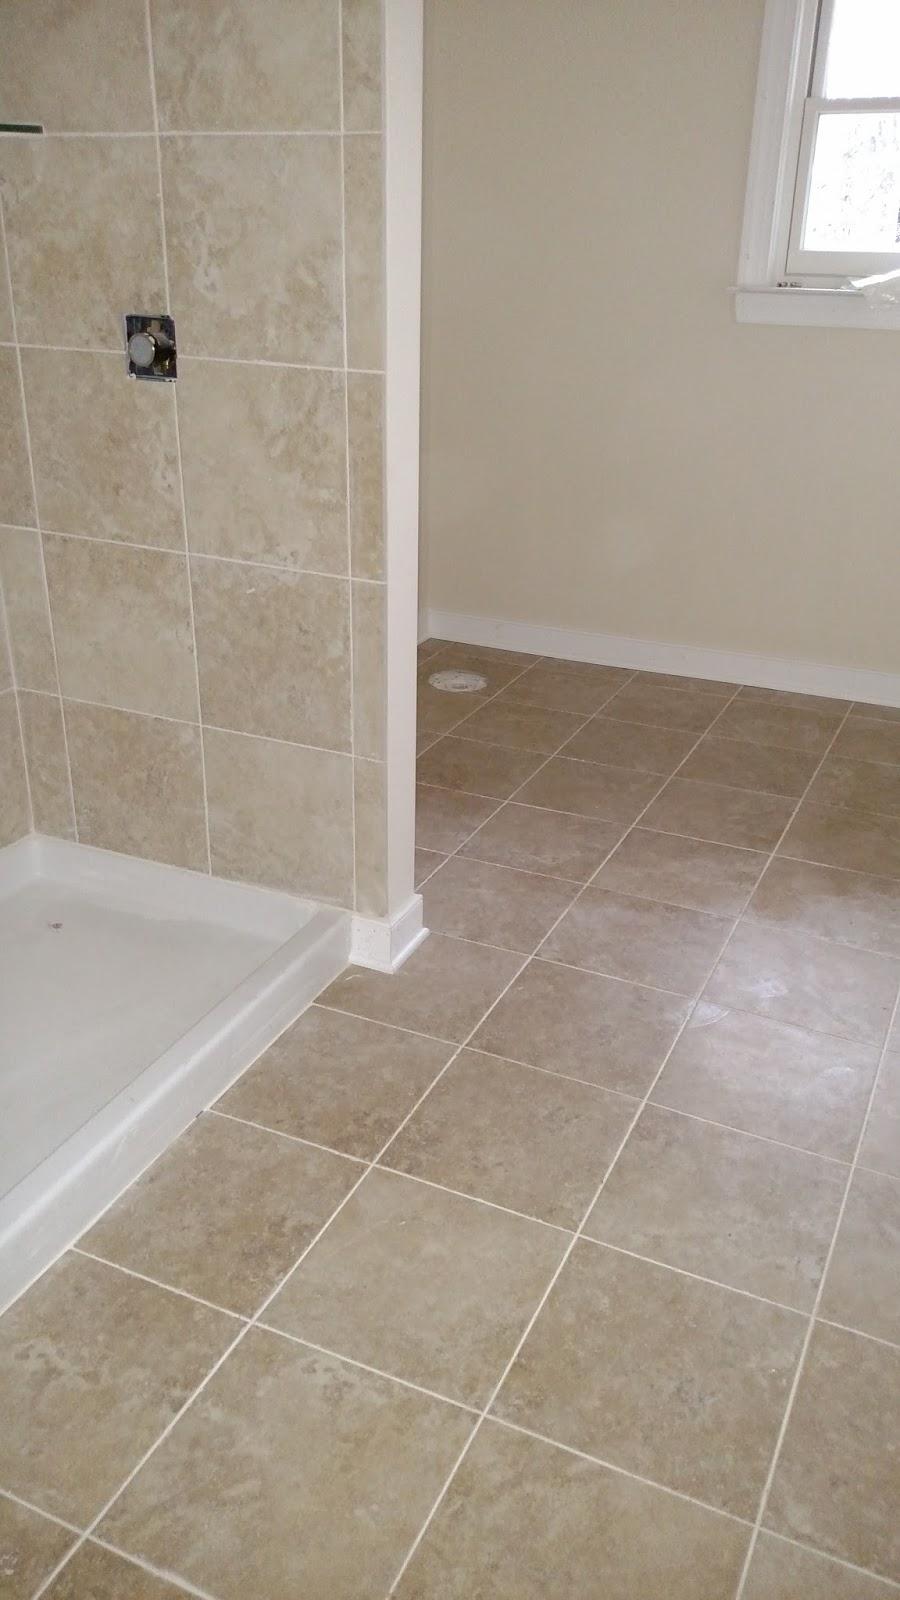 25 Best Tile Contractors - Richmond VA | HomeAdvisor